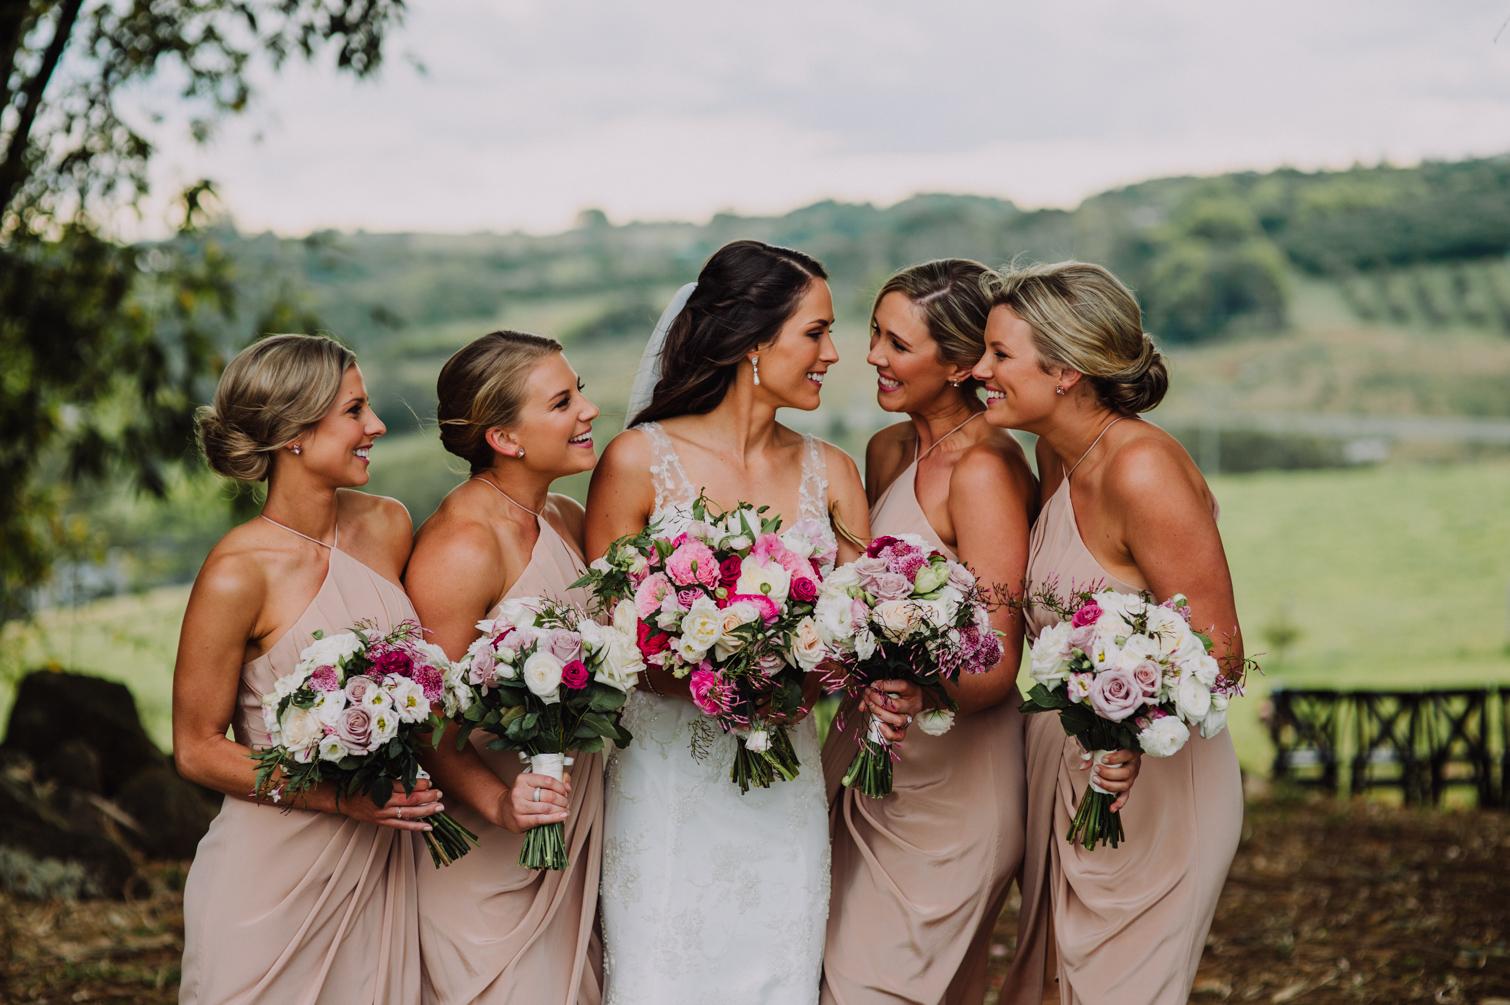 The_French_Petal_Wedding-Florist-8.jpg